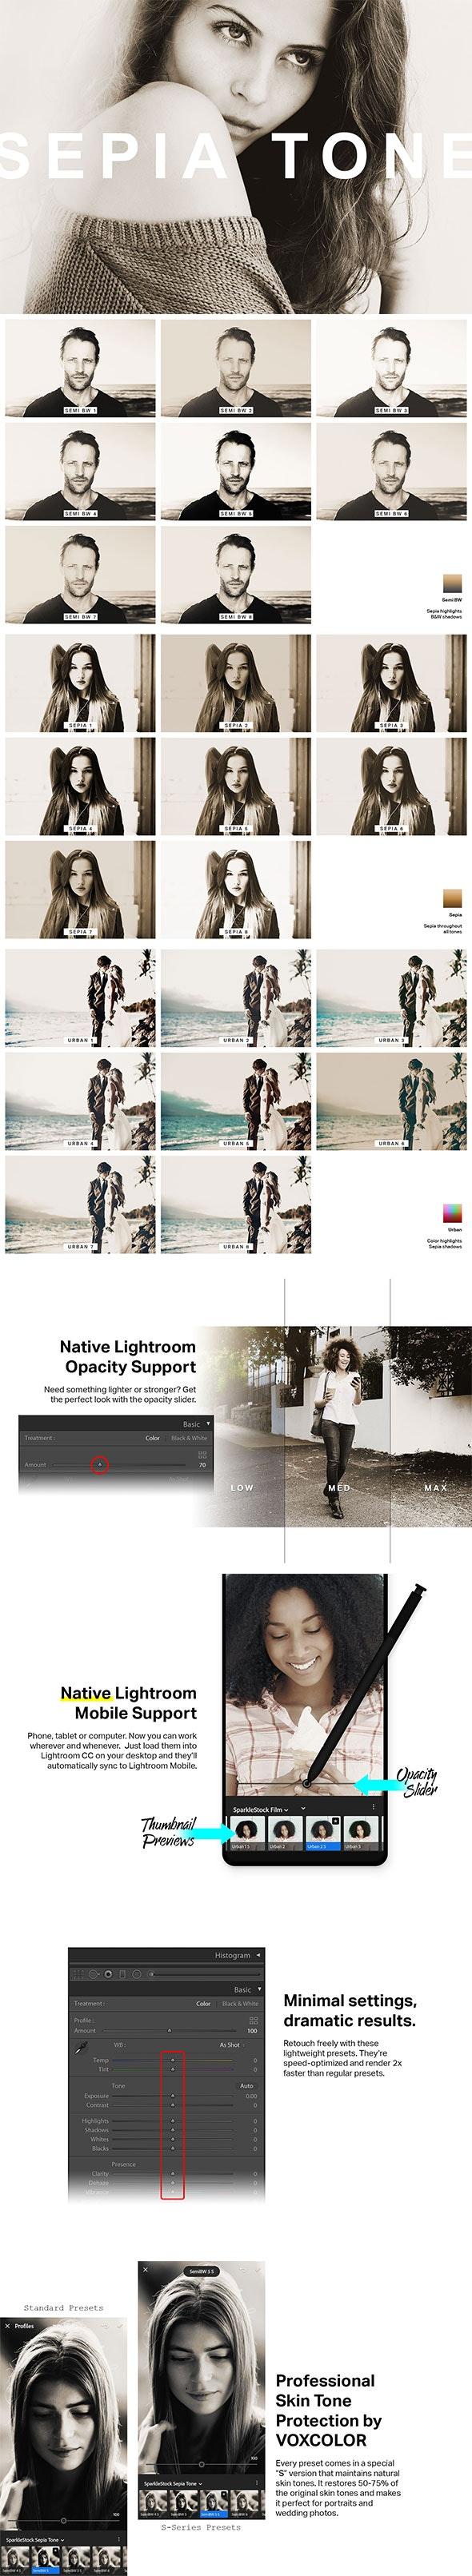 24 Sepia Tone Lightroom Presets and LUTs